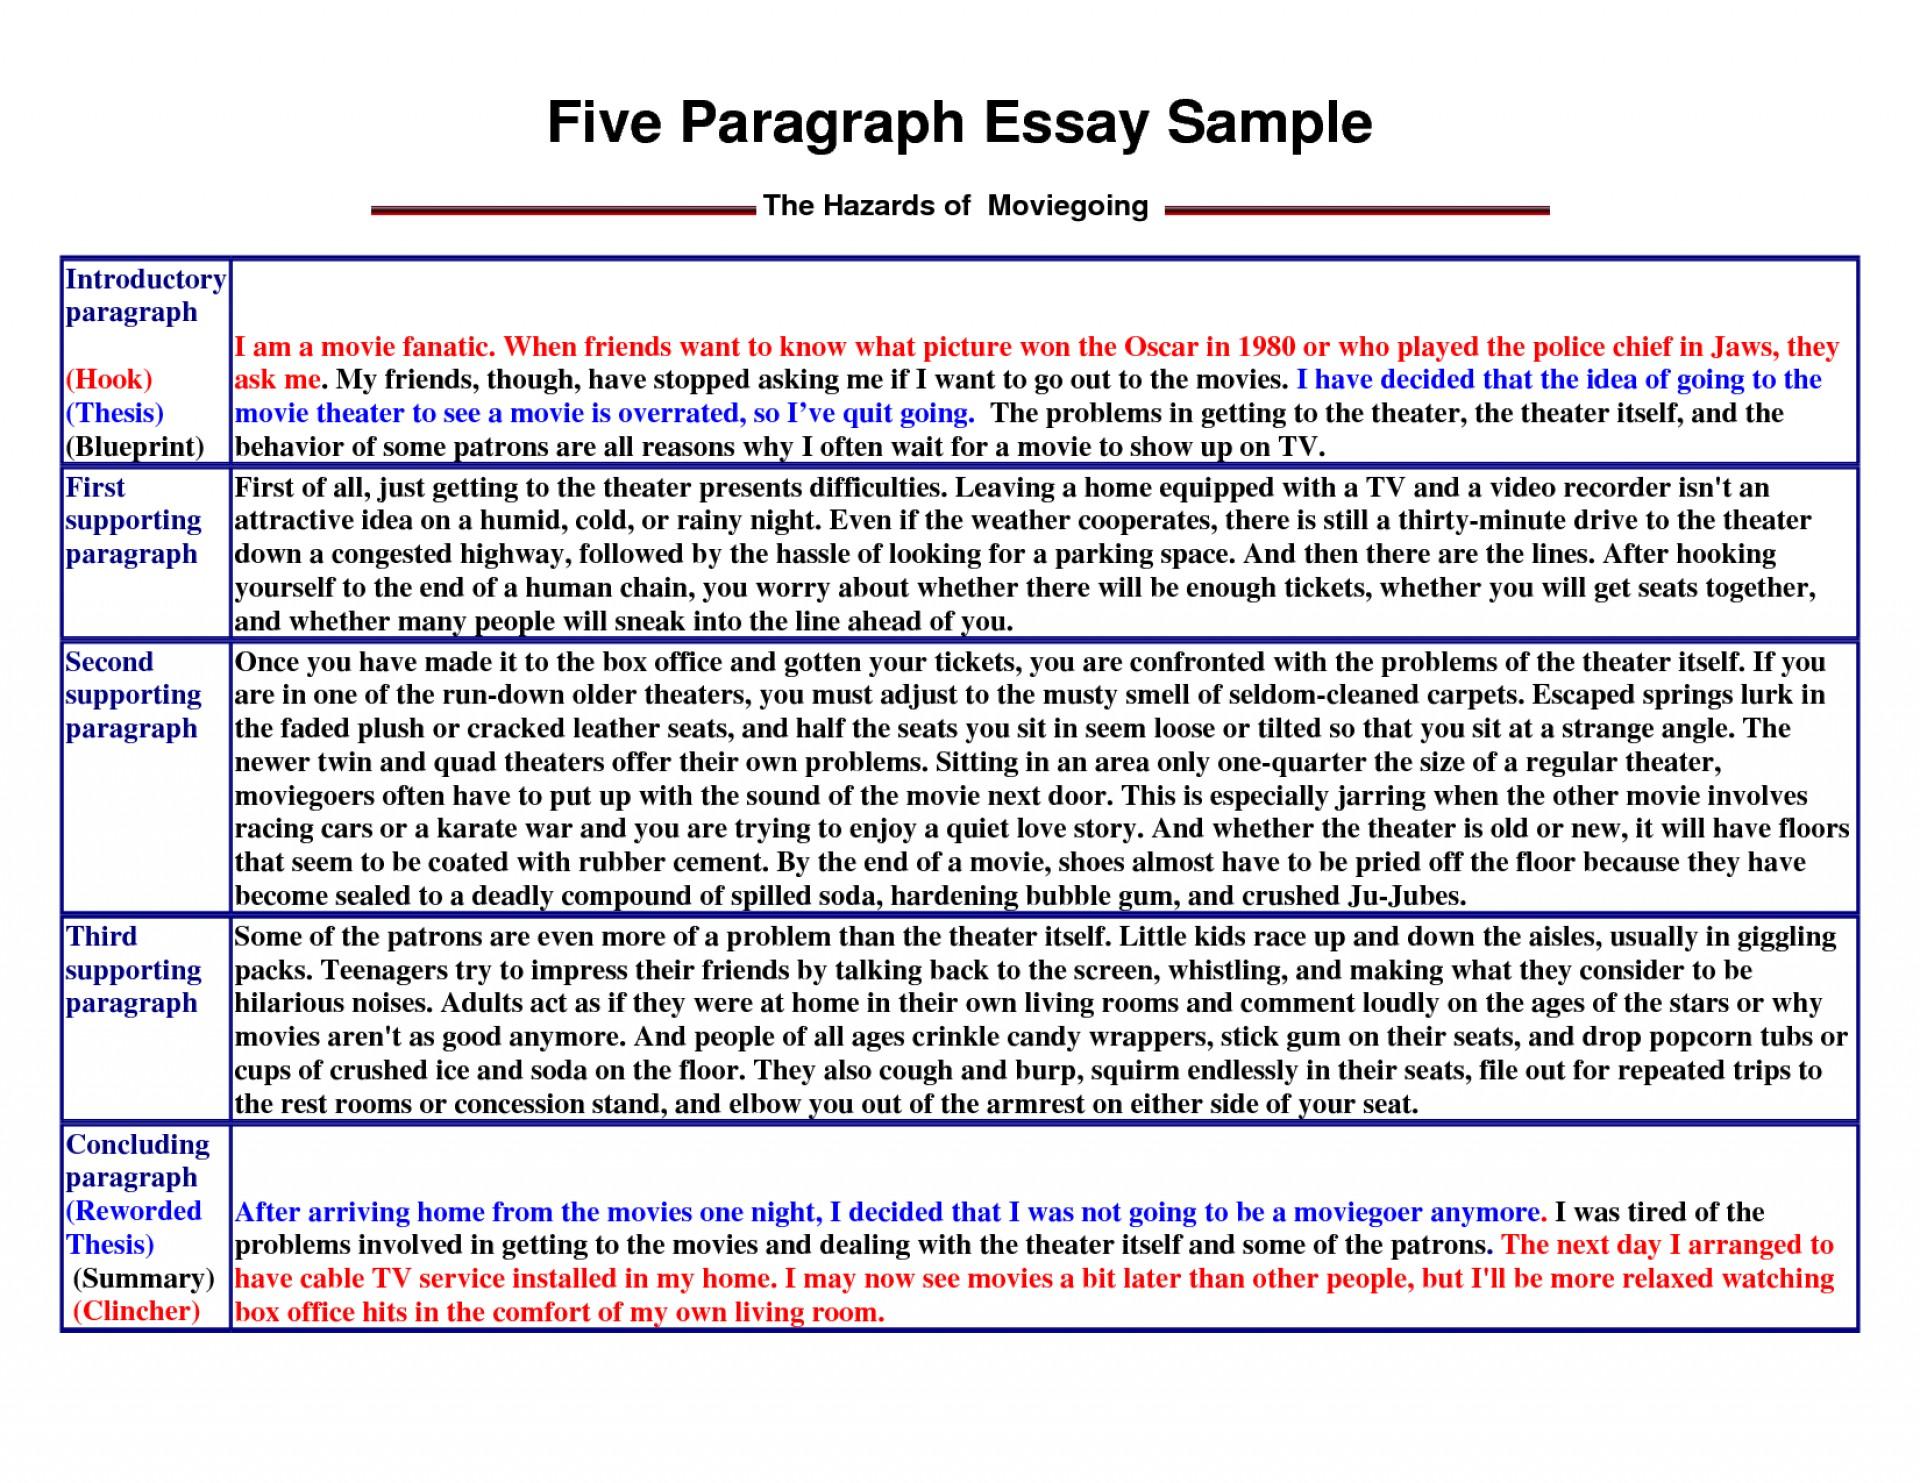 010 Essay Example Paragraph High Sensational 5 School Pdf Template For 1920